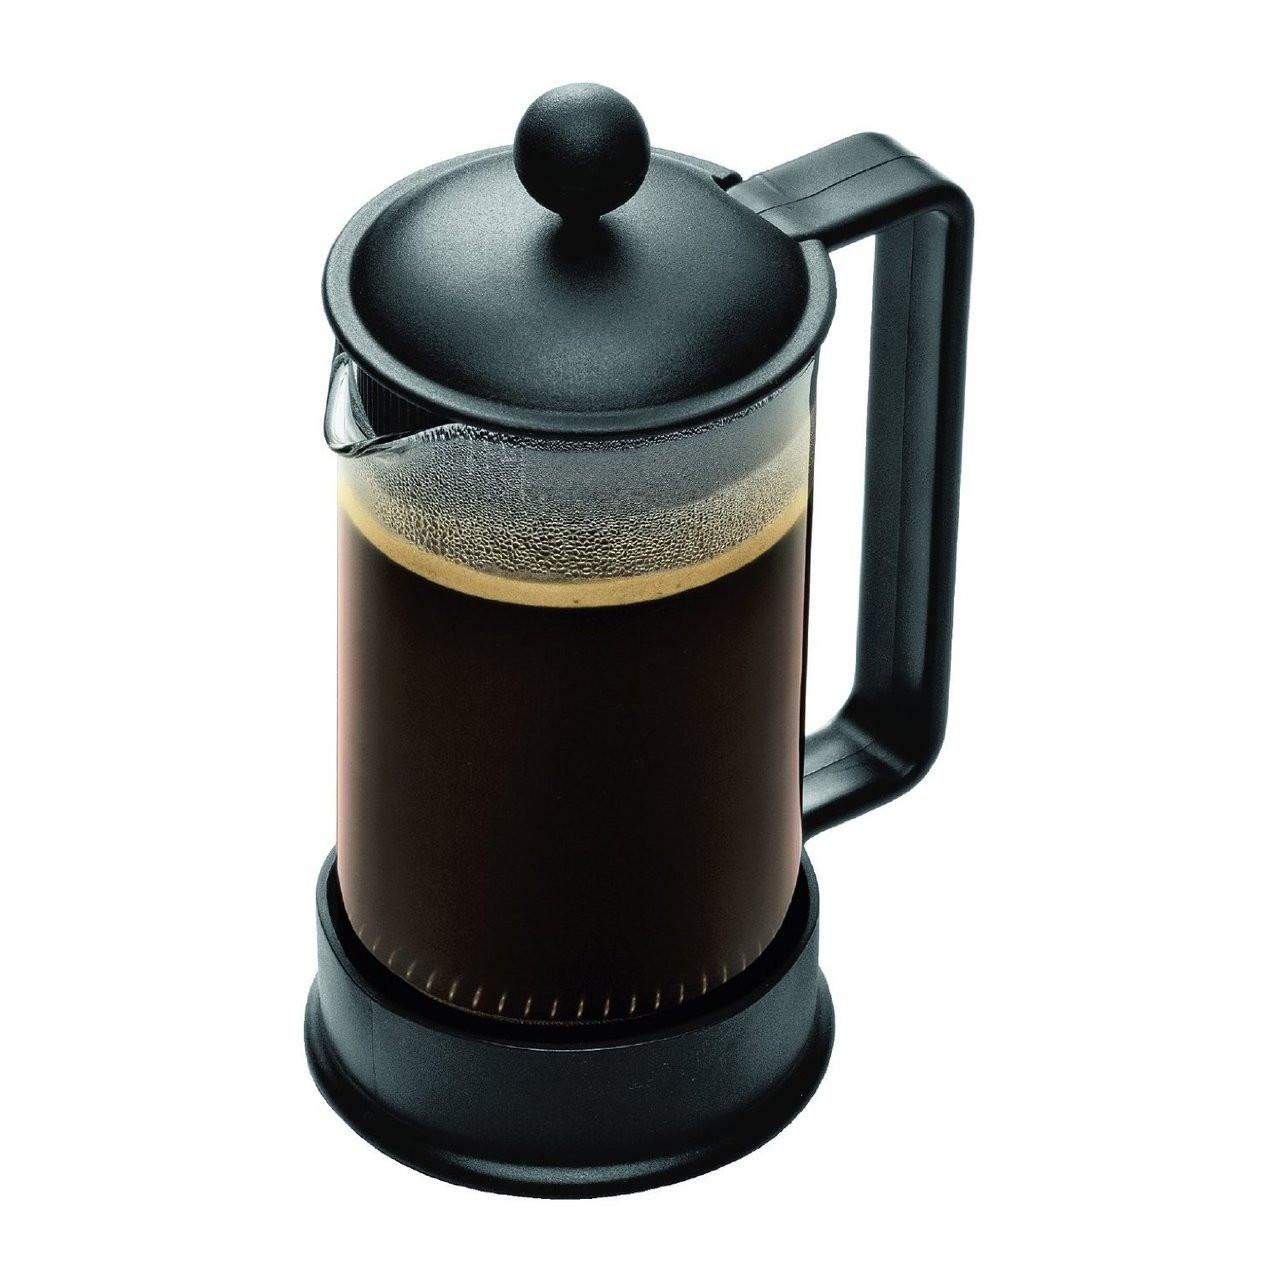 Bodum Brazil 3 Cup French Press Coffee Maker 12 Oz Black For Moms